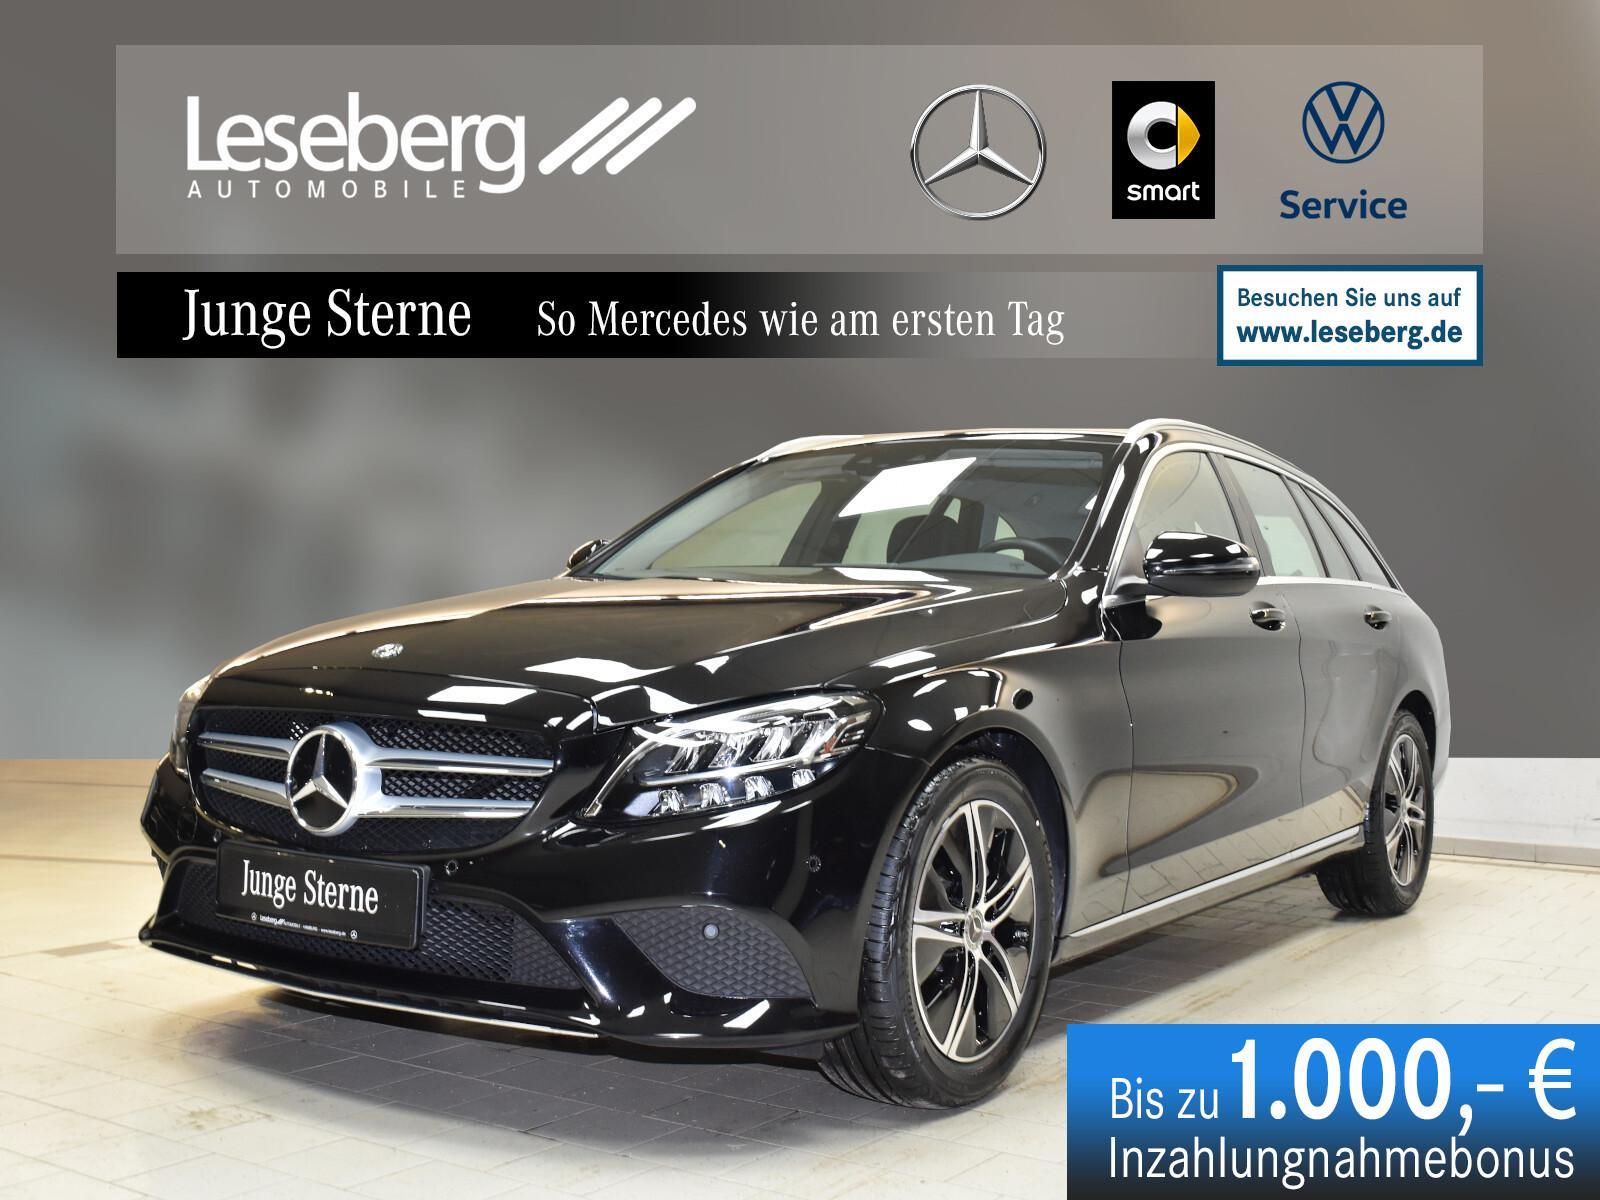 Mercedes-Benz C 180 T Avantgarde/Navi/Kamera/LED/9G/Spur/Totw., Jahr 2020, Benzin